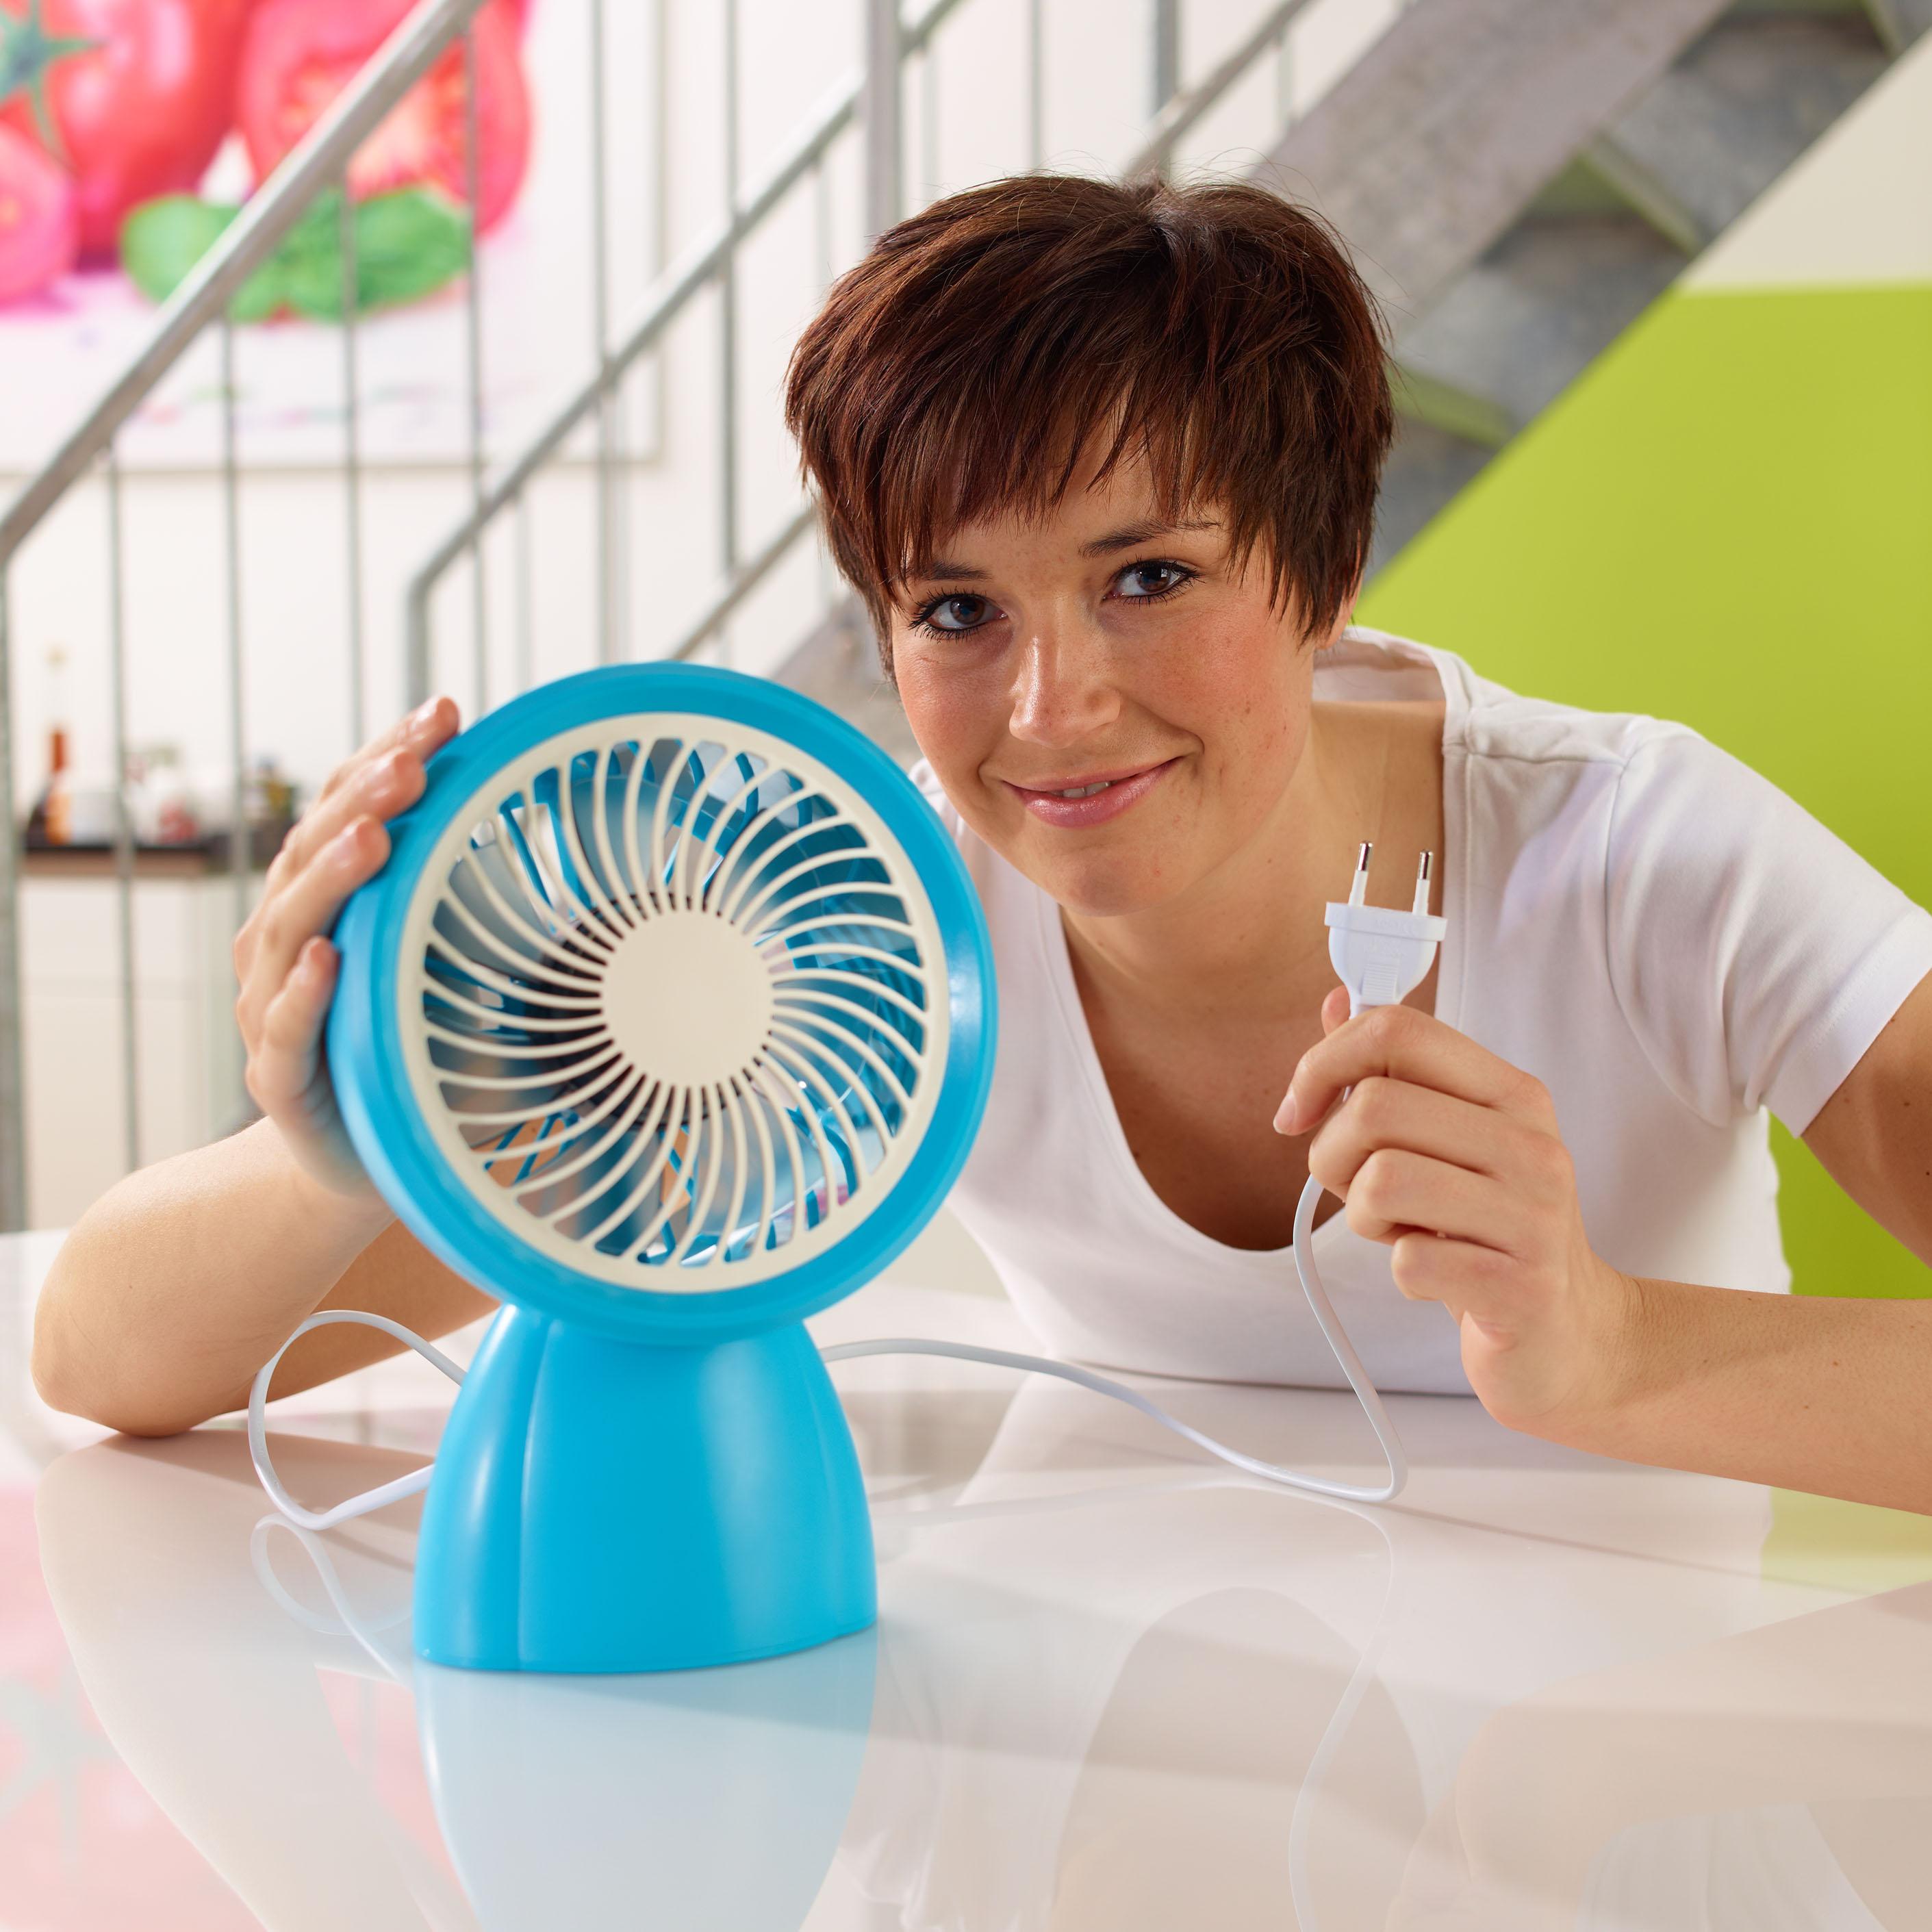 Fotodesign-matthias-schütz-idol-ventilator-hand